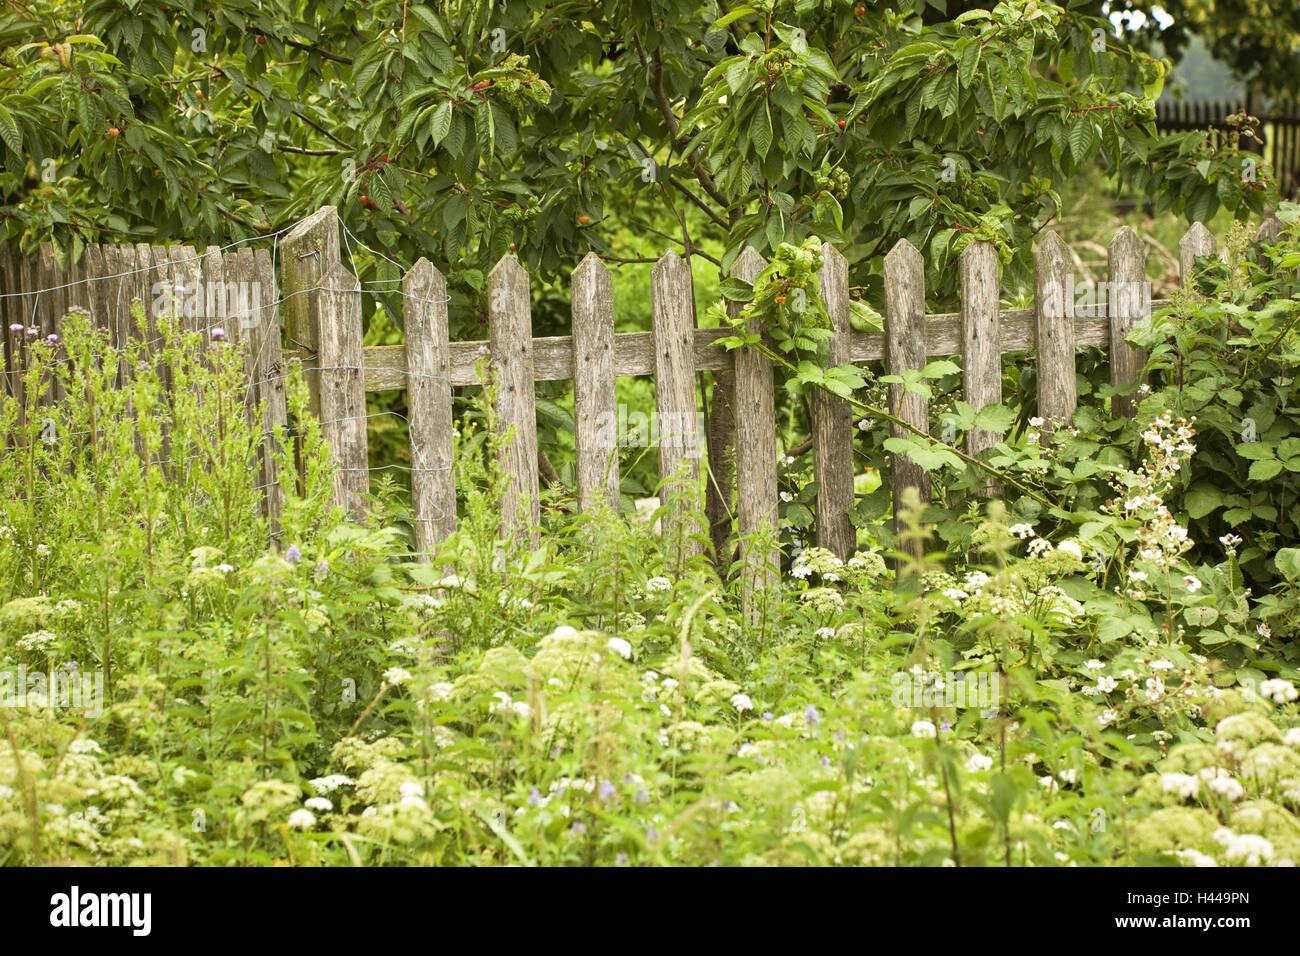 Fence, garden, ragged, - Stock Image